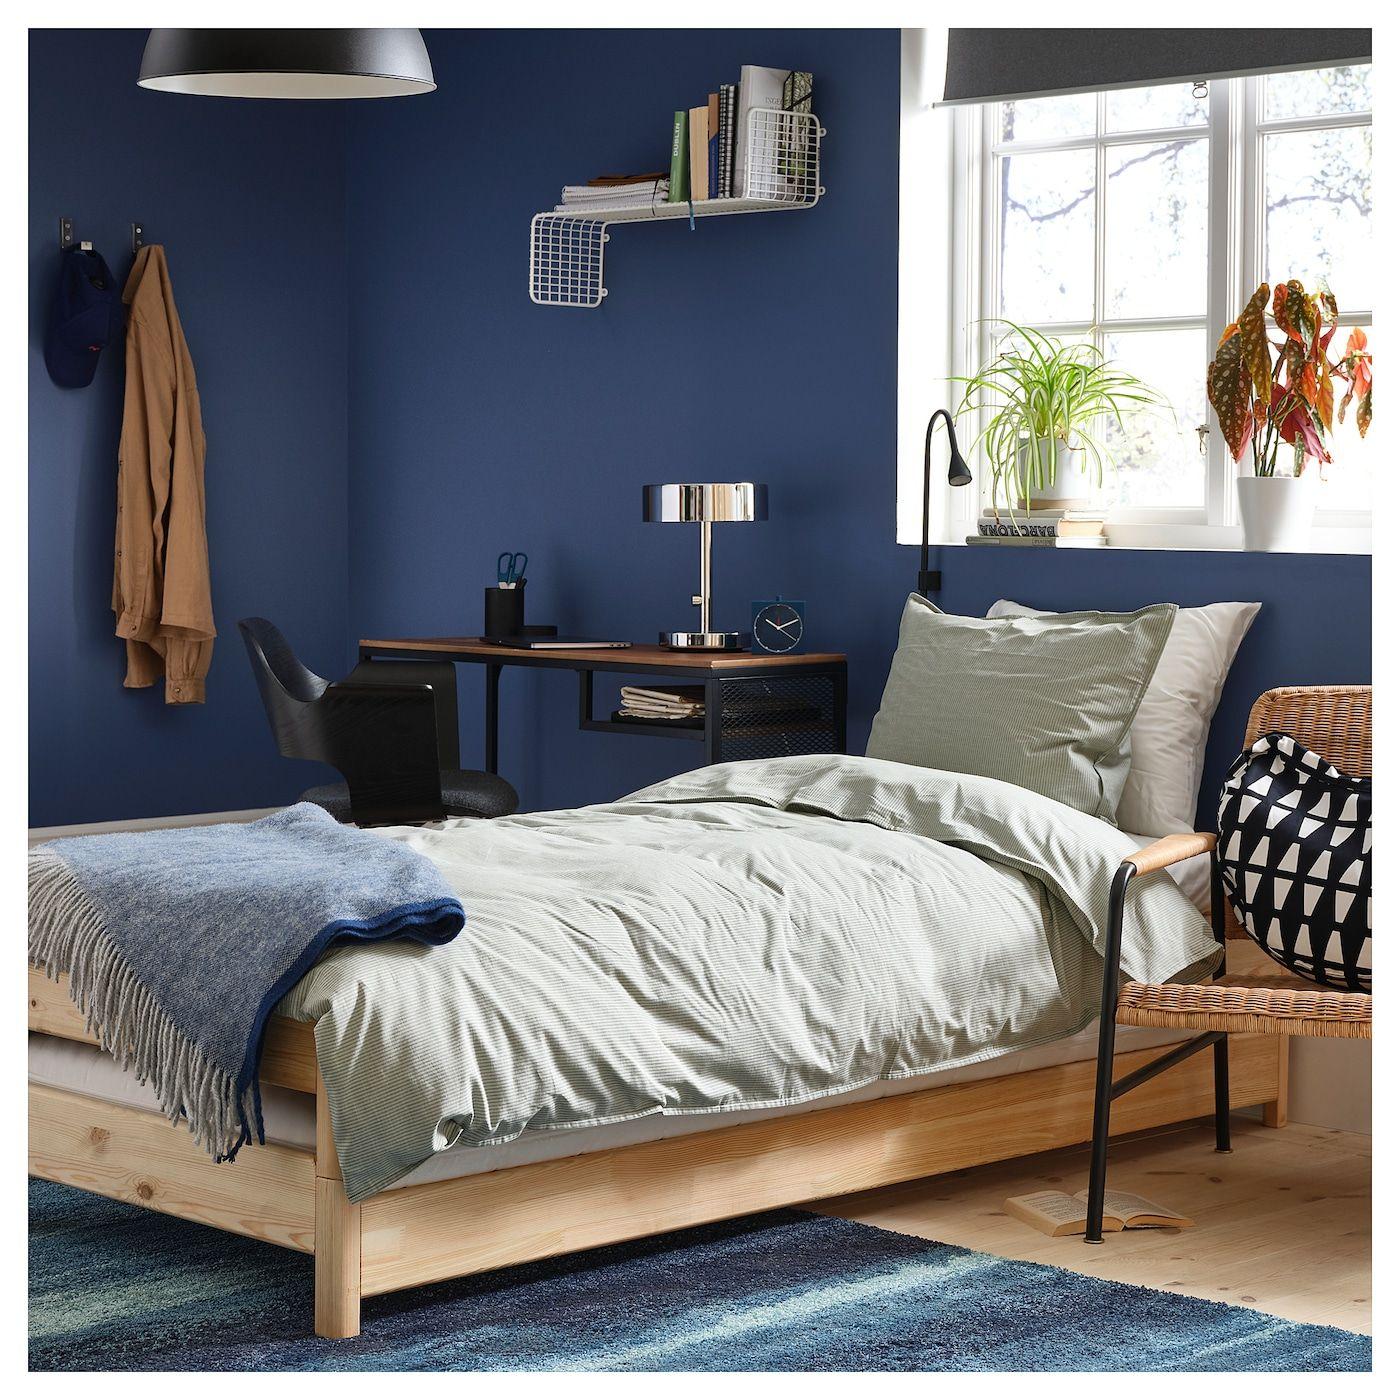 UTÅKER Stackable bed with 2 mattresses, pine, Husvika